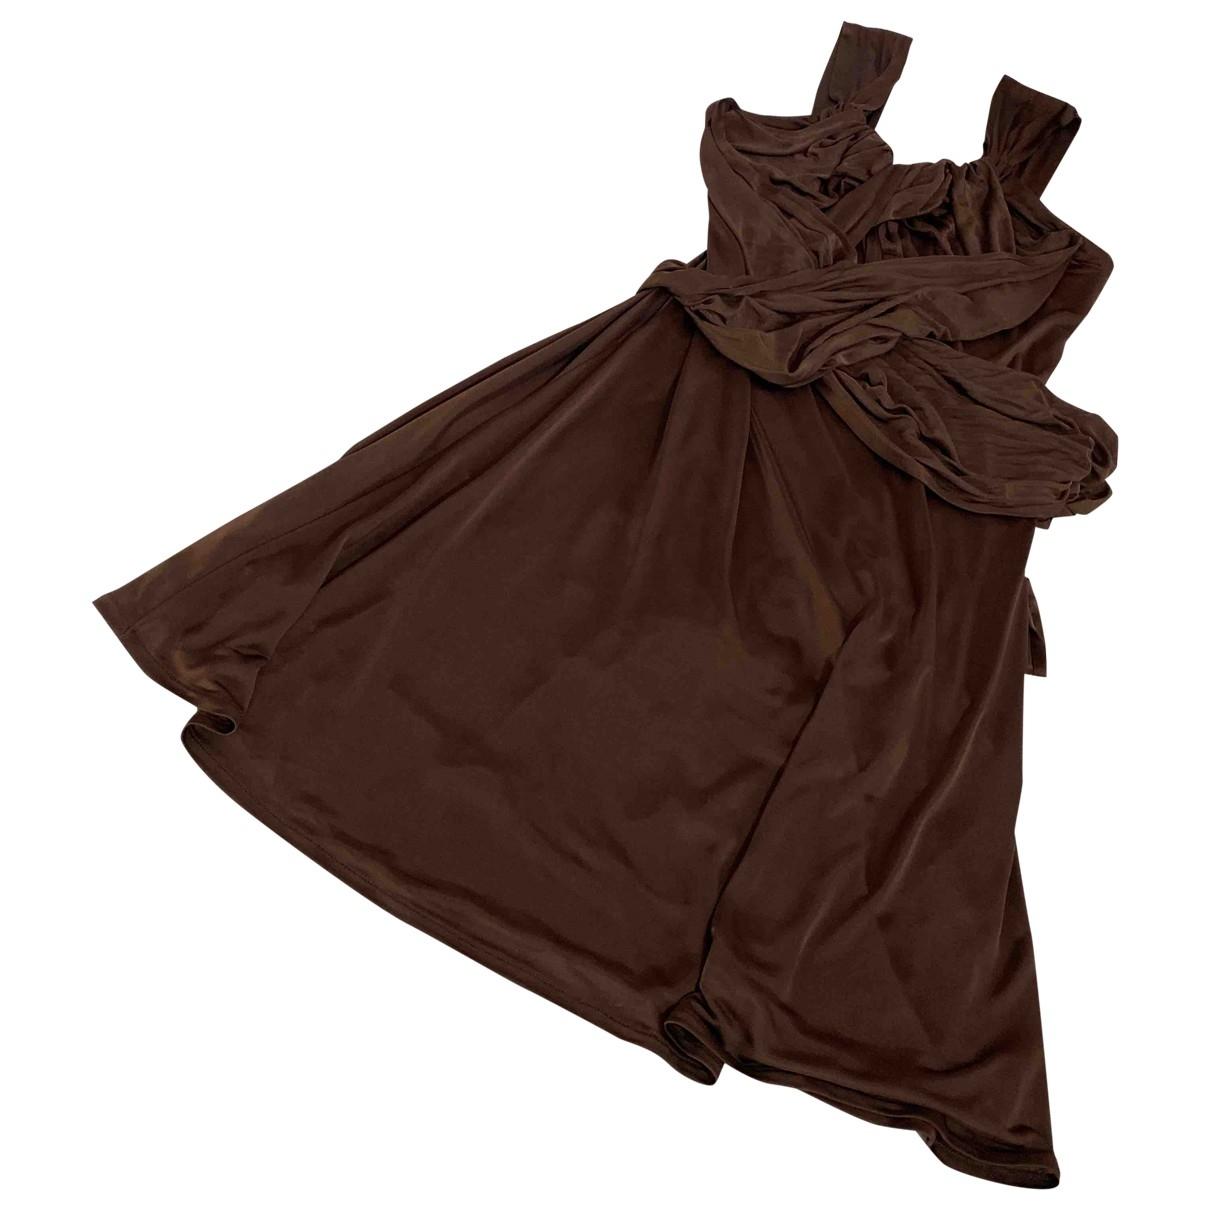 Valentino Garavani \N Brown dress for Women 40 IT